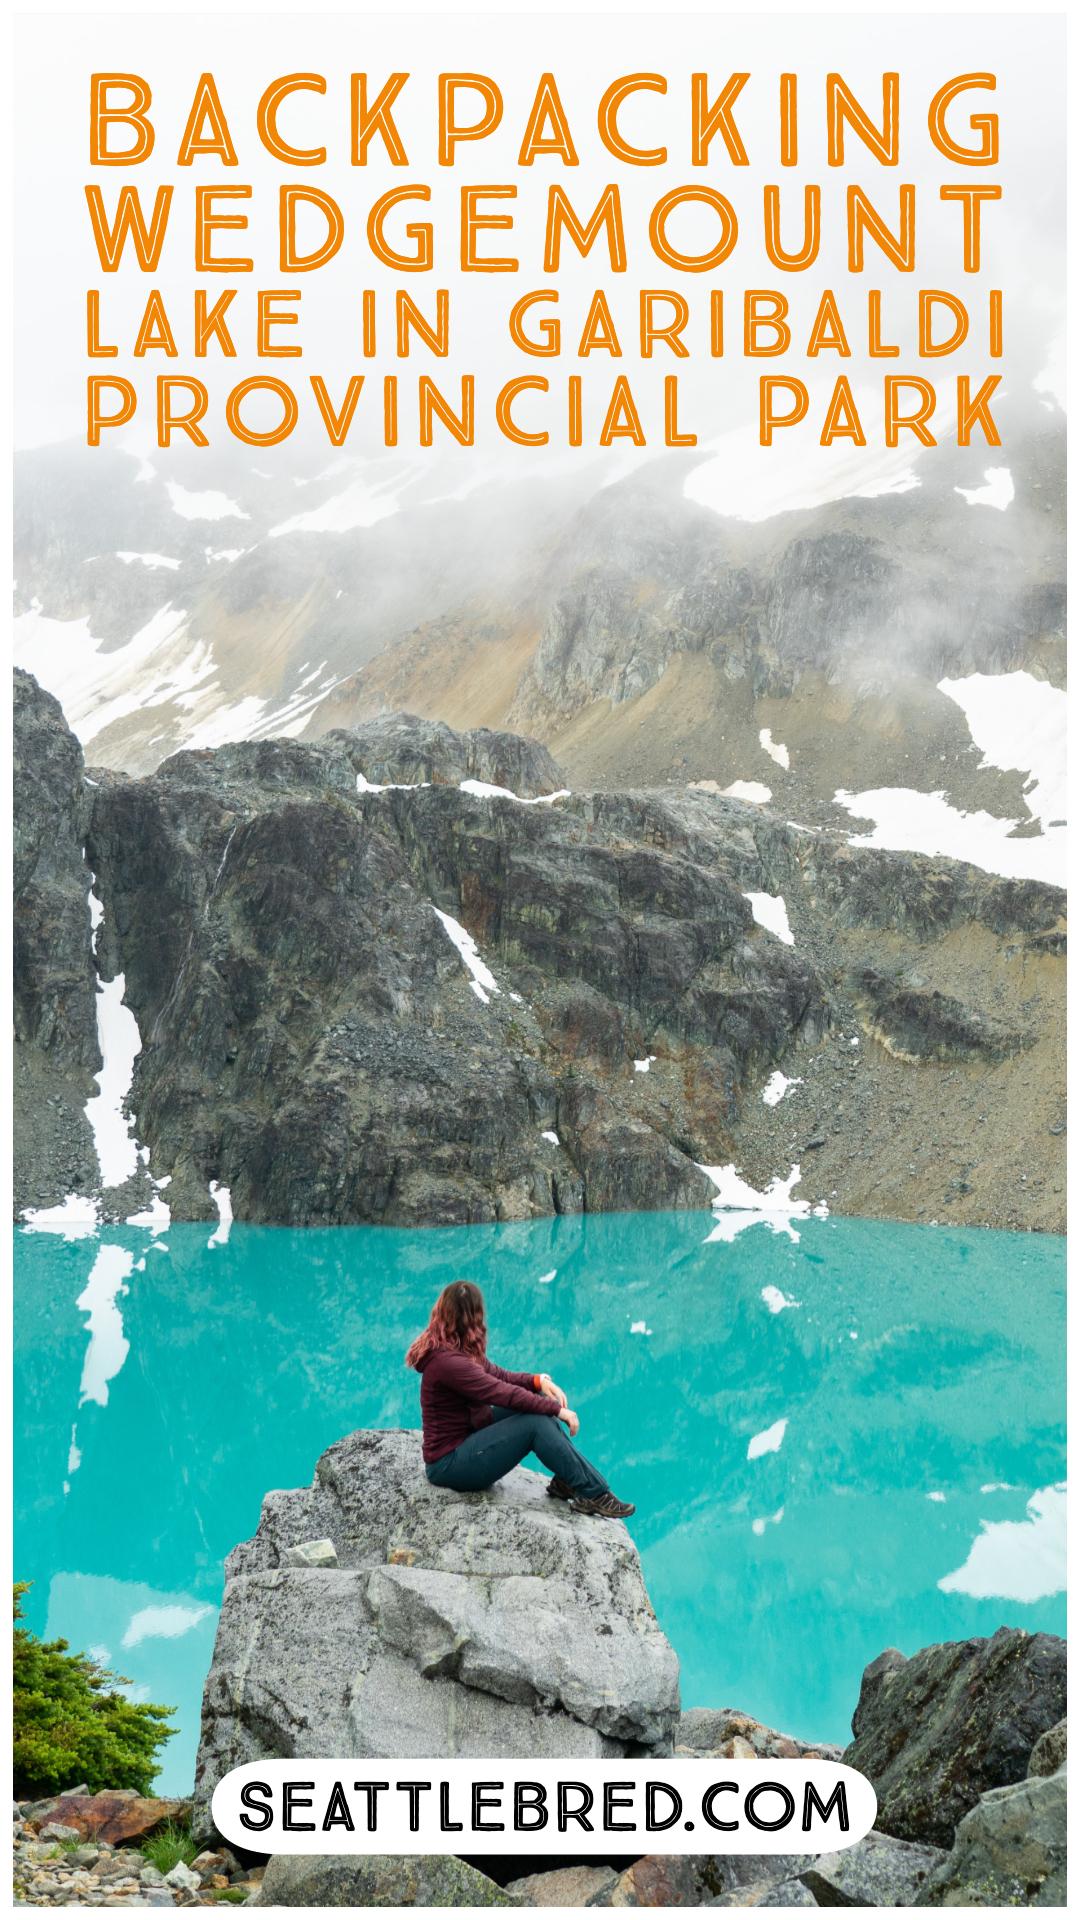 Backpacking-wedgemount-lake-in-garibaldi-provincial-park.jpg